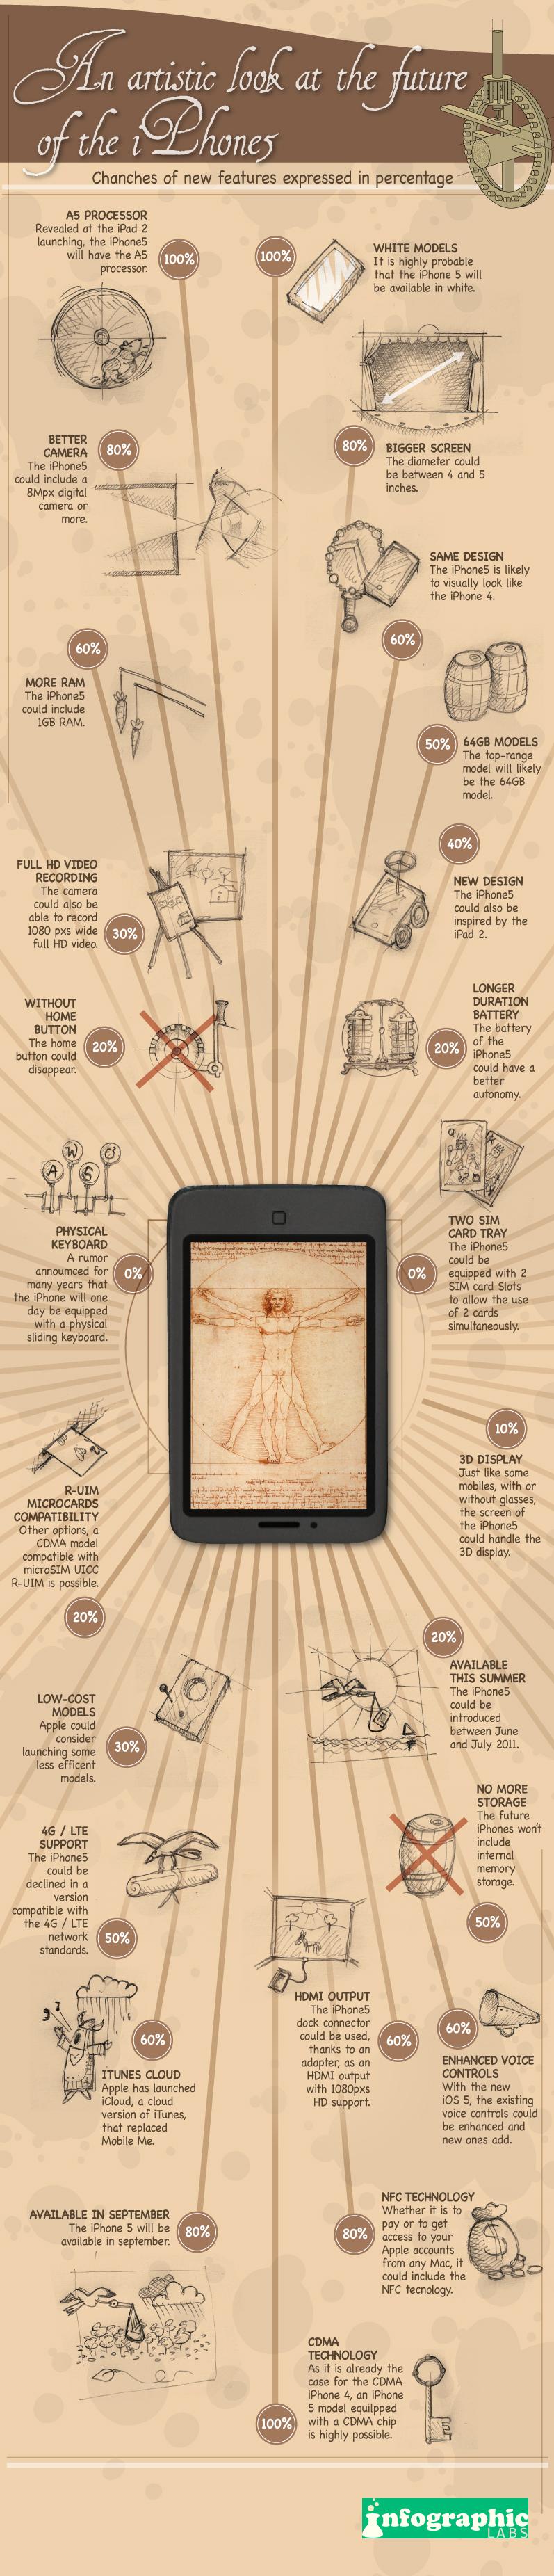 Infográfico artístico do iPhone 5